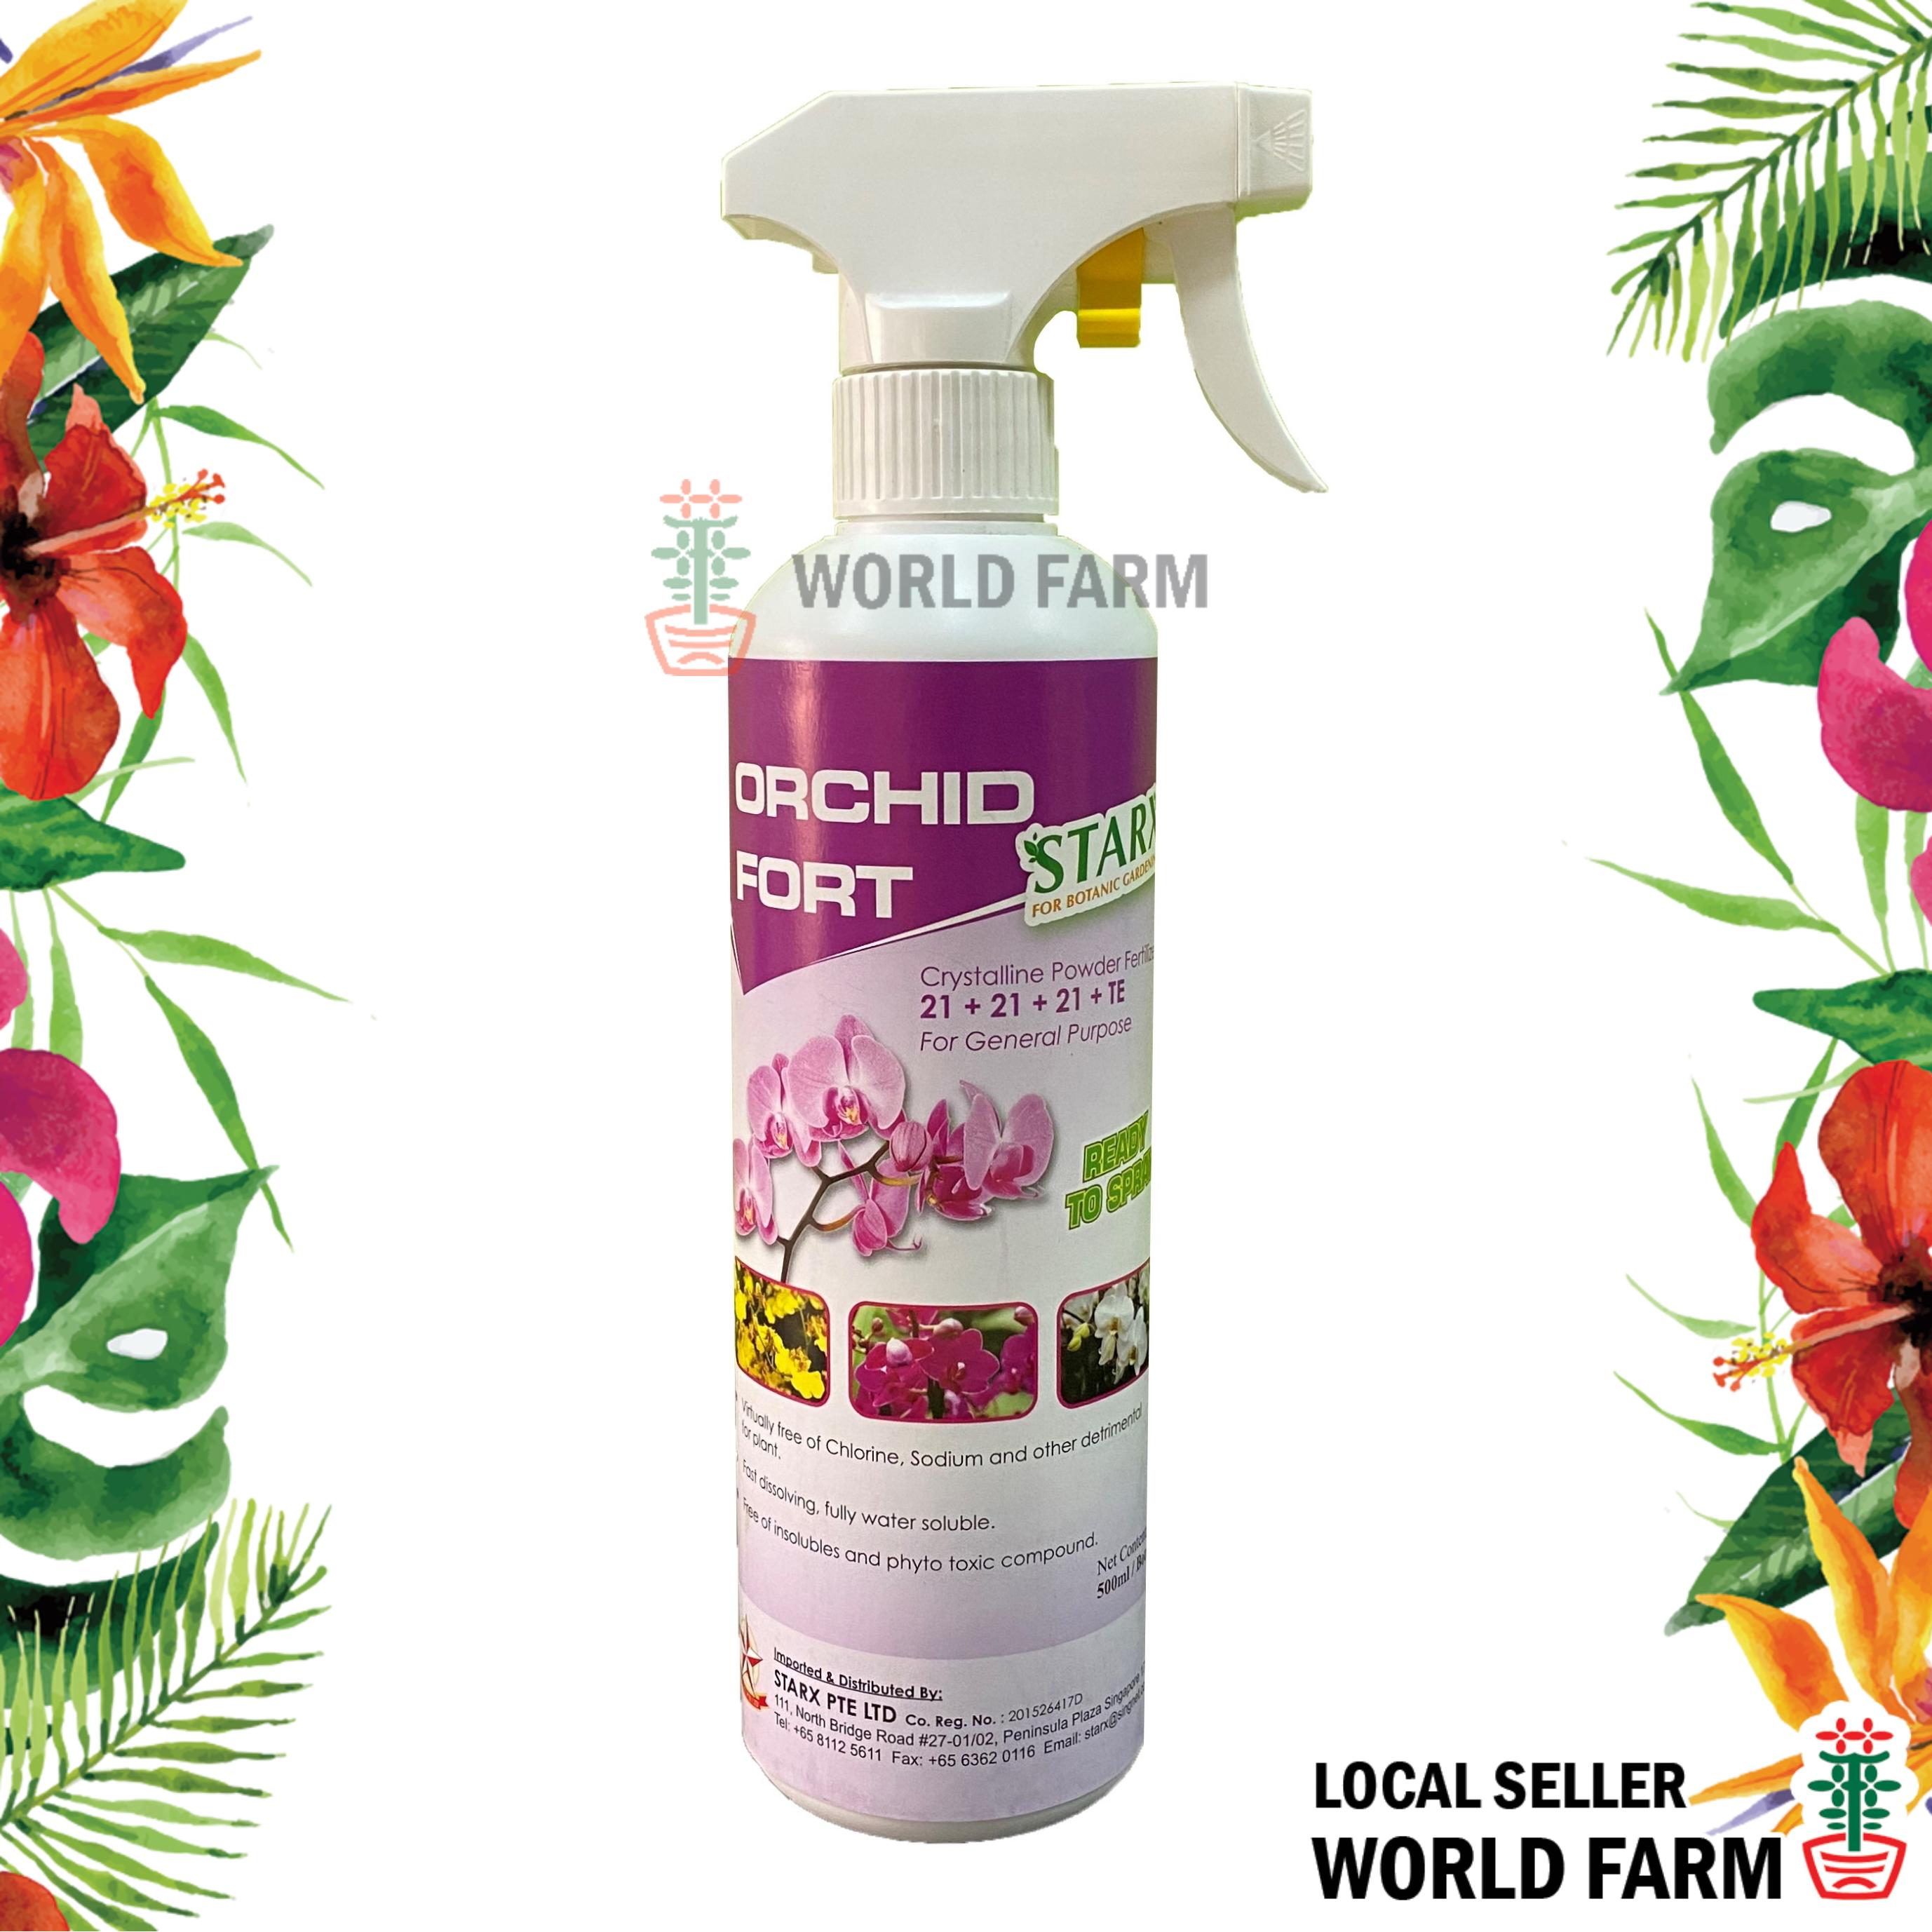 Orchid Fort General Purpose Orchid Fertiliser / Fertilizer Spray 500ml